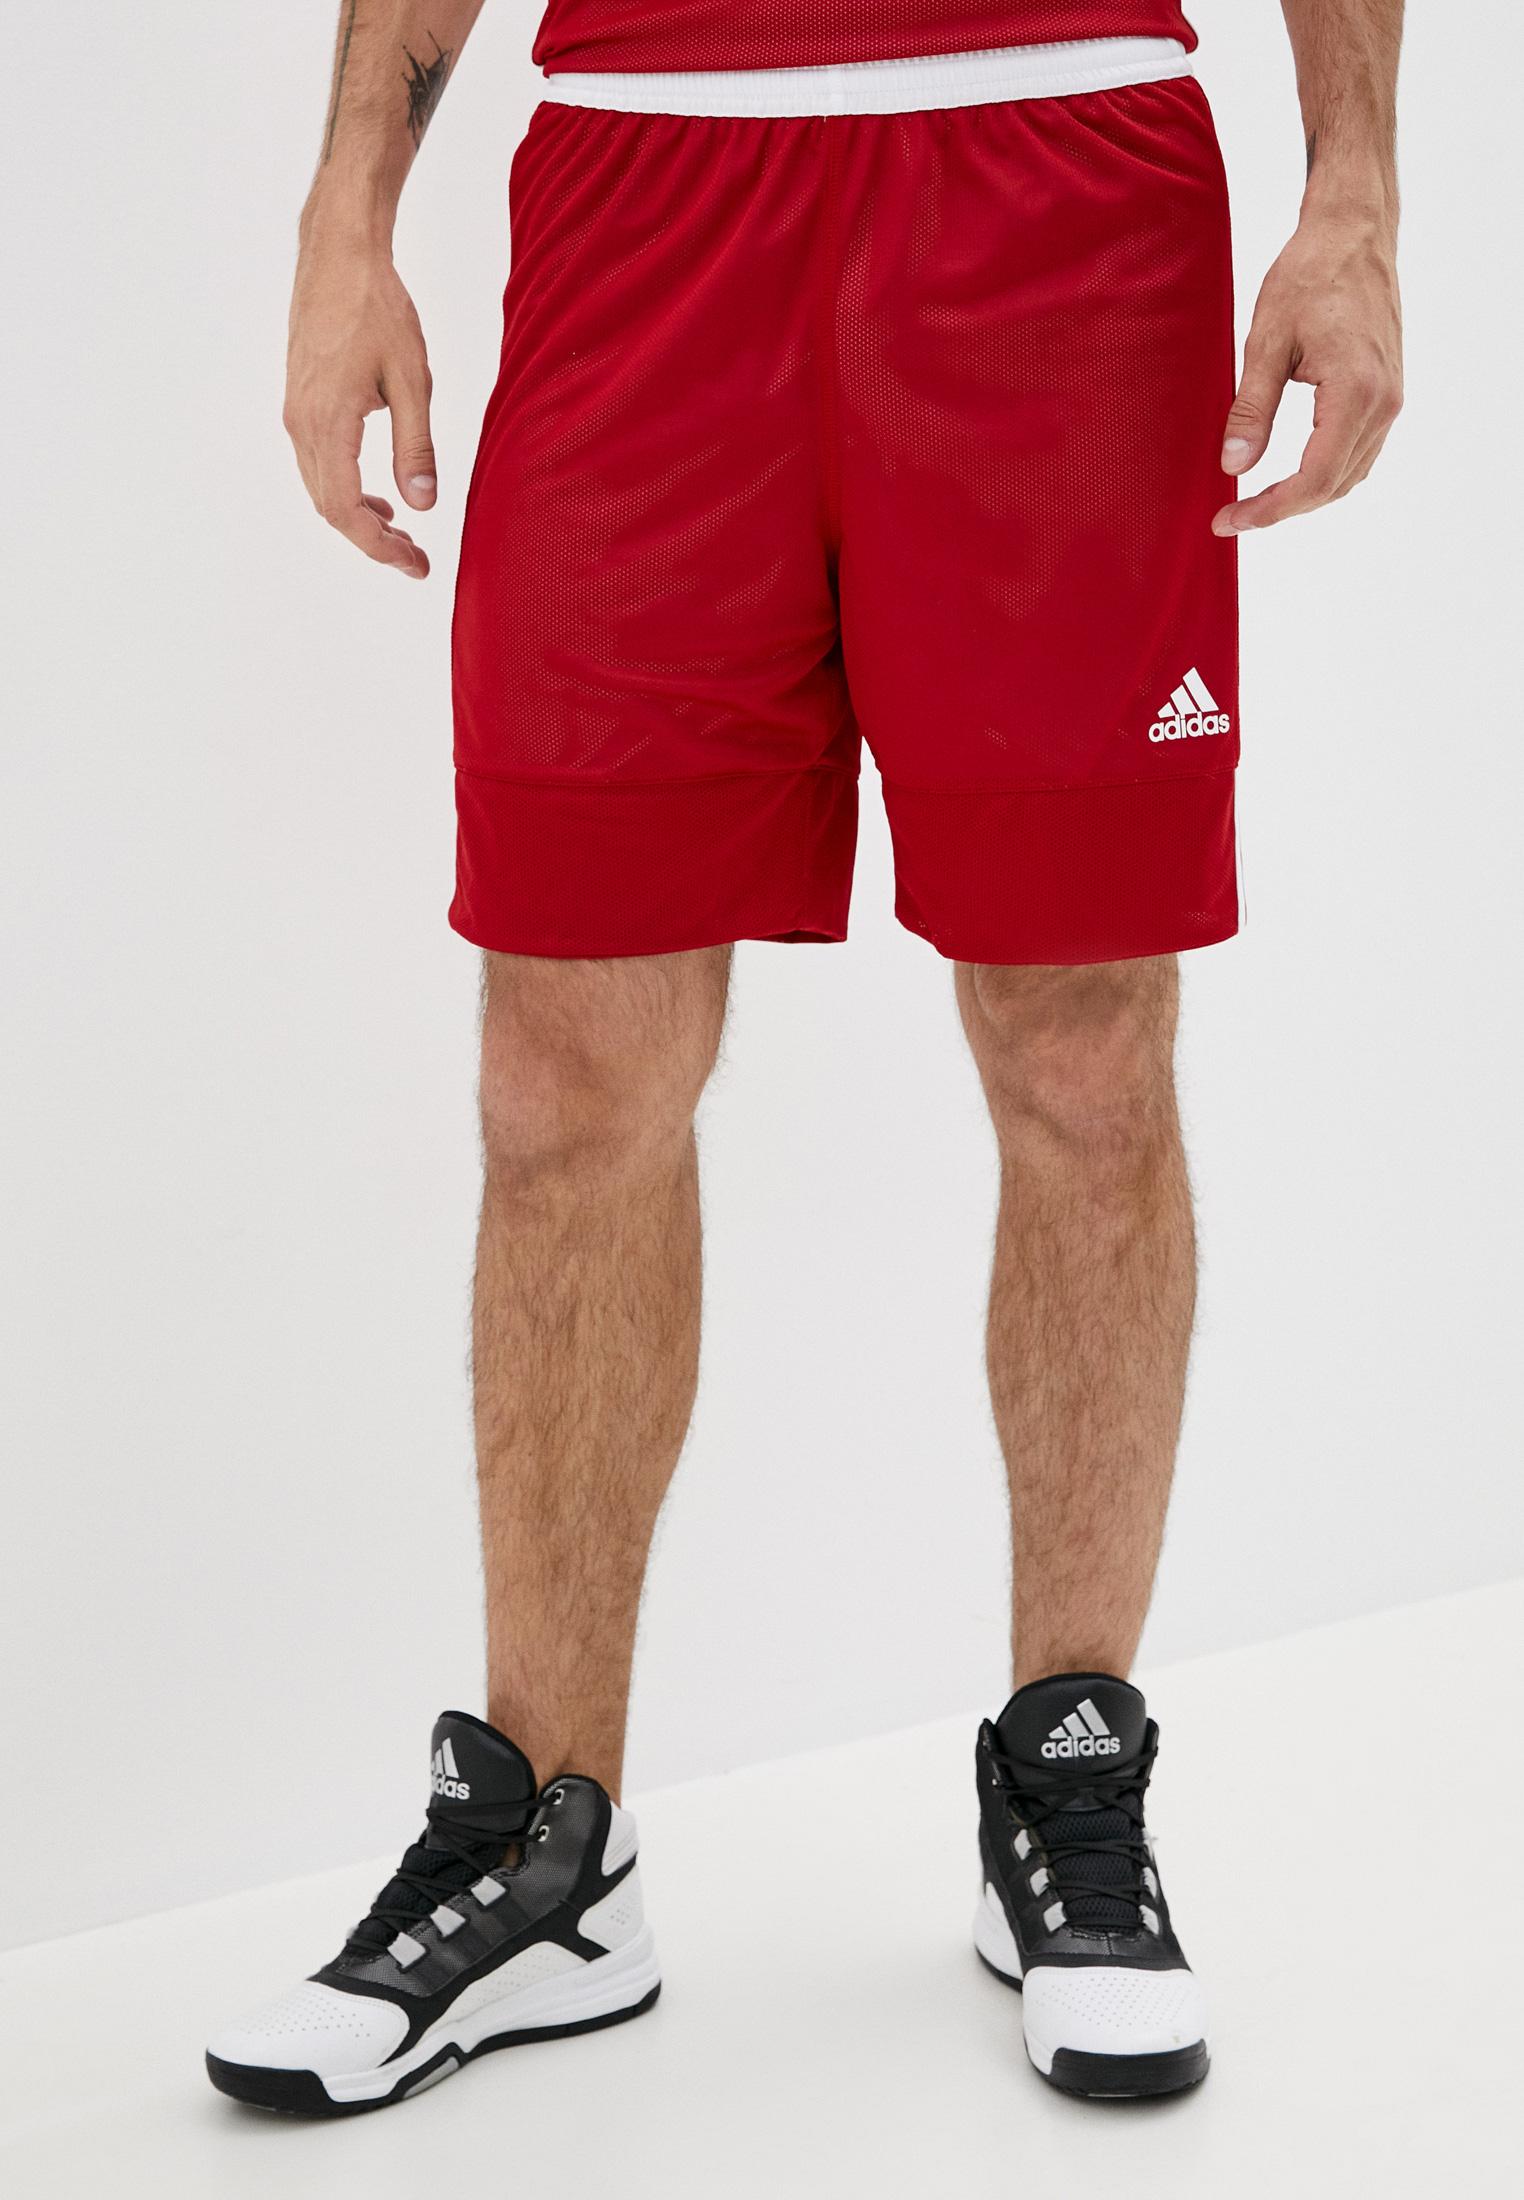 Мужские шорты Adidas (Адидас) DY6603